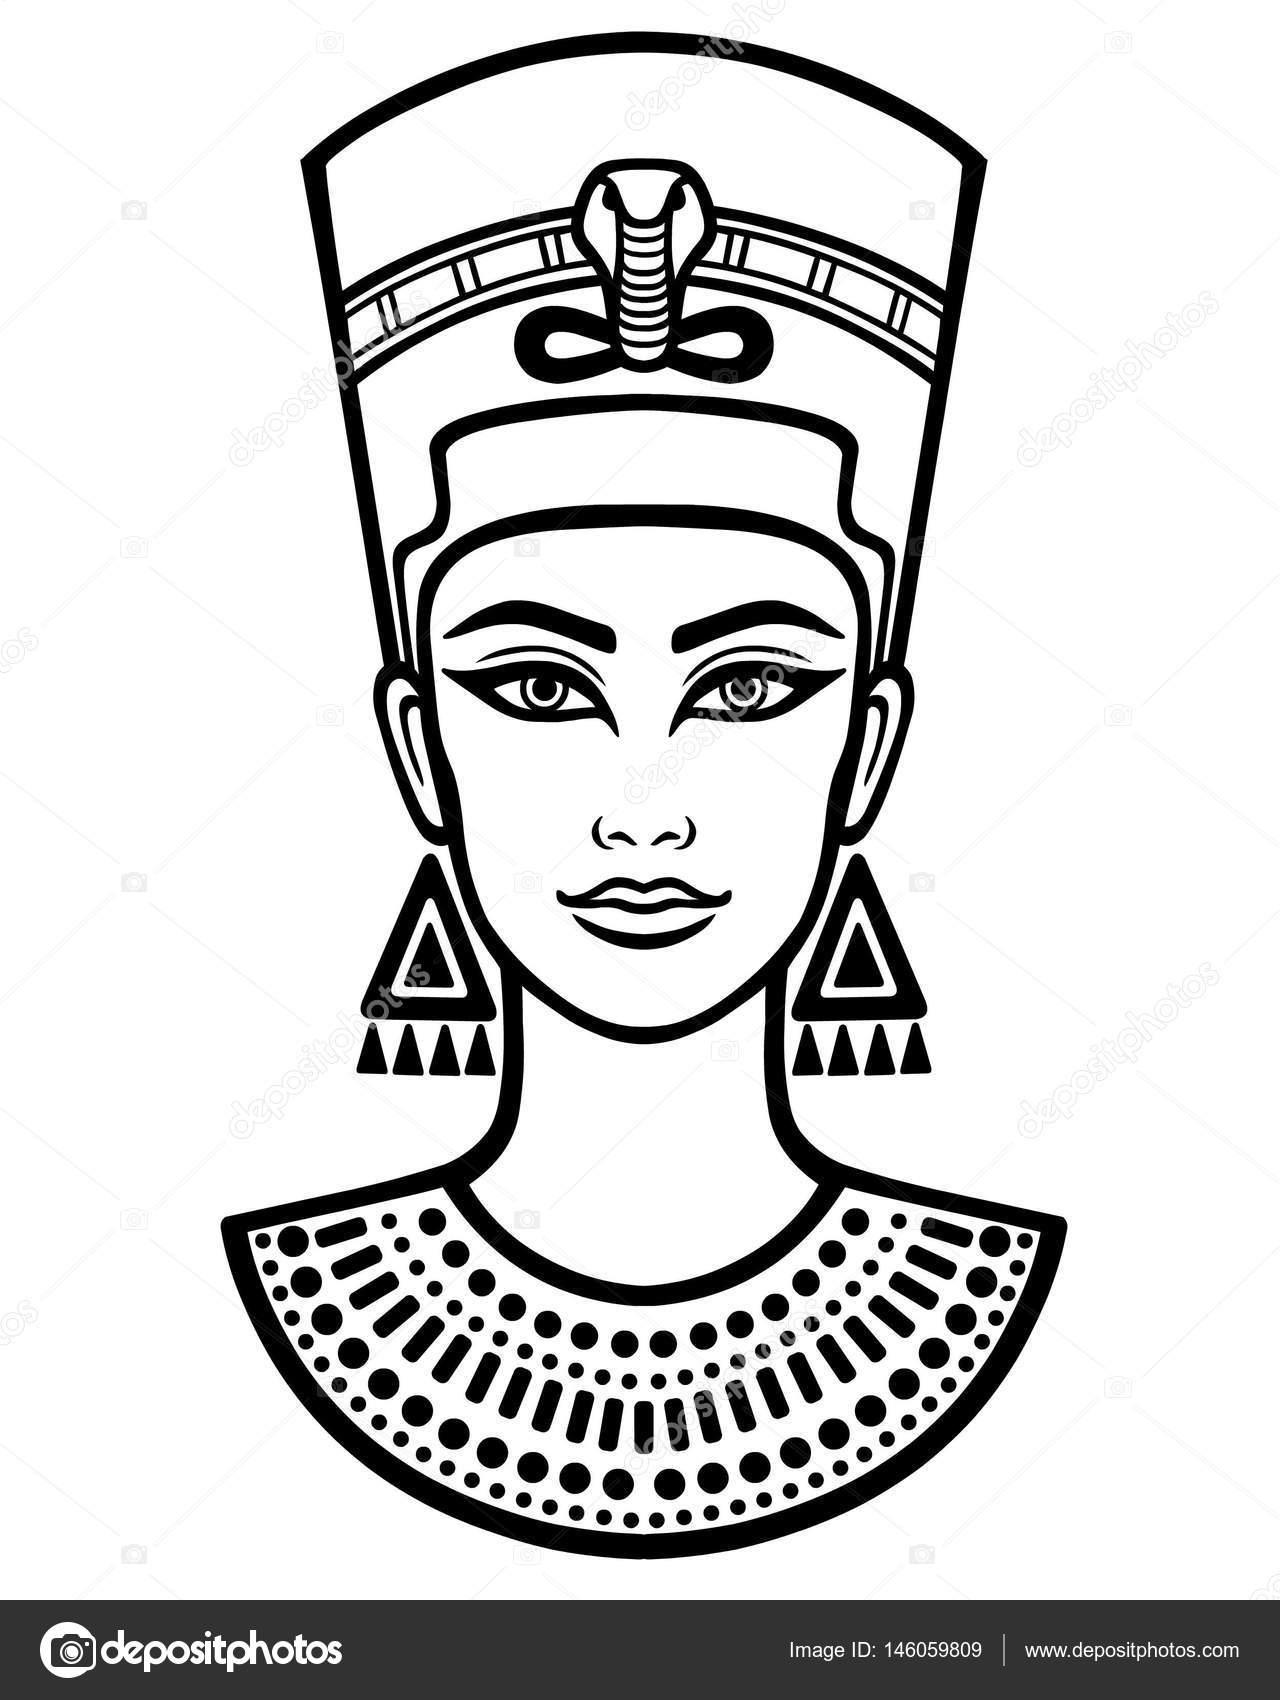 Animation portrait of the beautiful Egyptian woman. Black